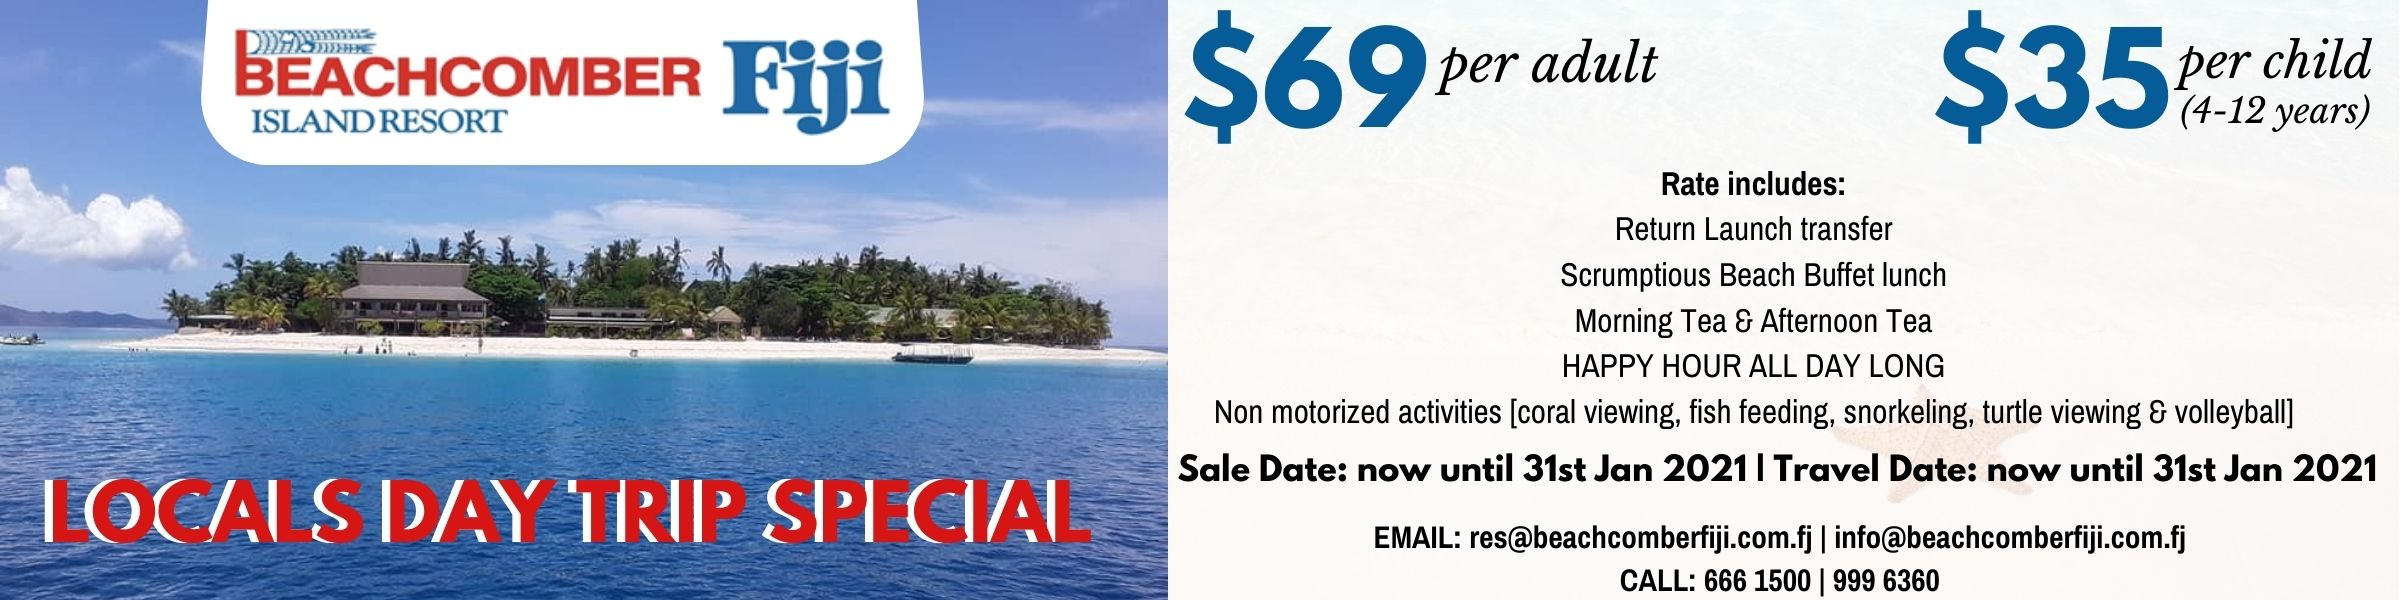 Beachcomber Island Fiji Day Trip Deal Jan 2021